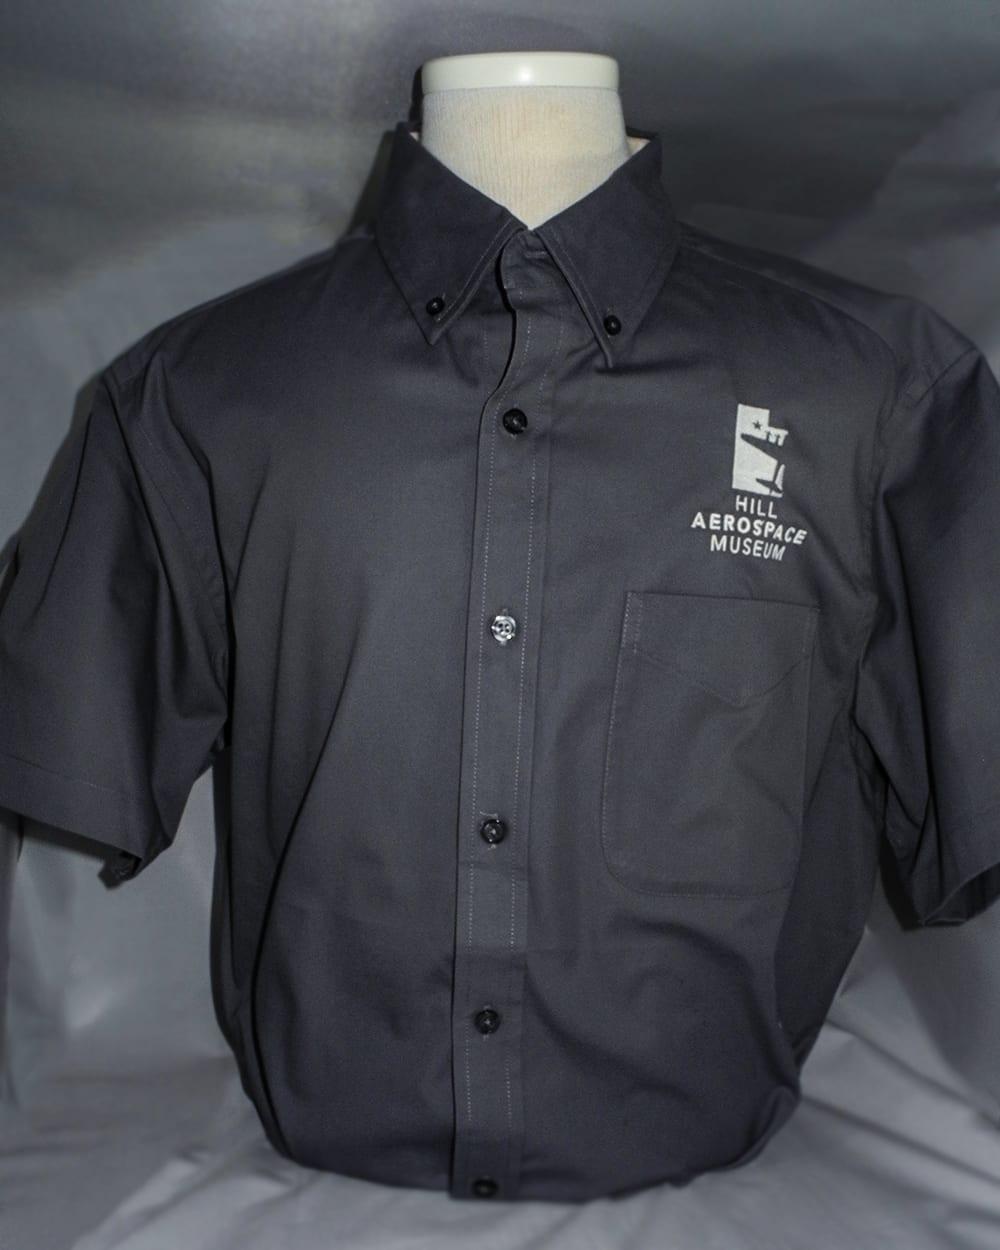 Hill Aerospace Museum Shirt 1